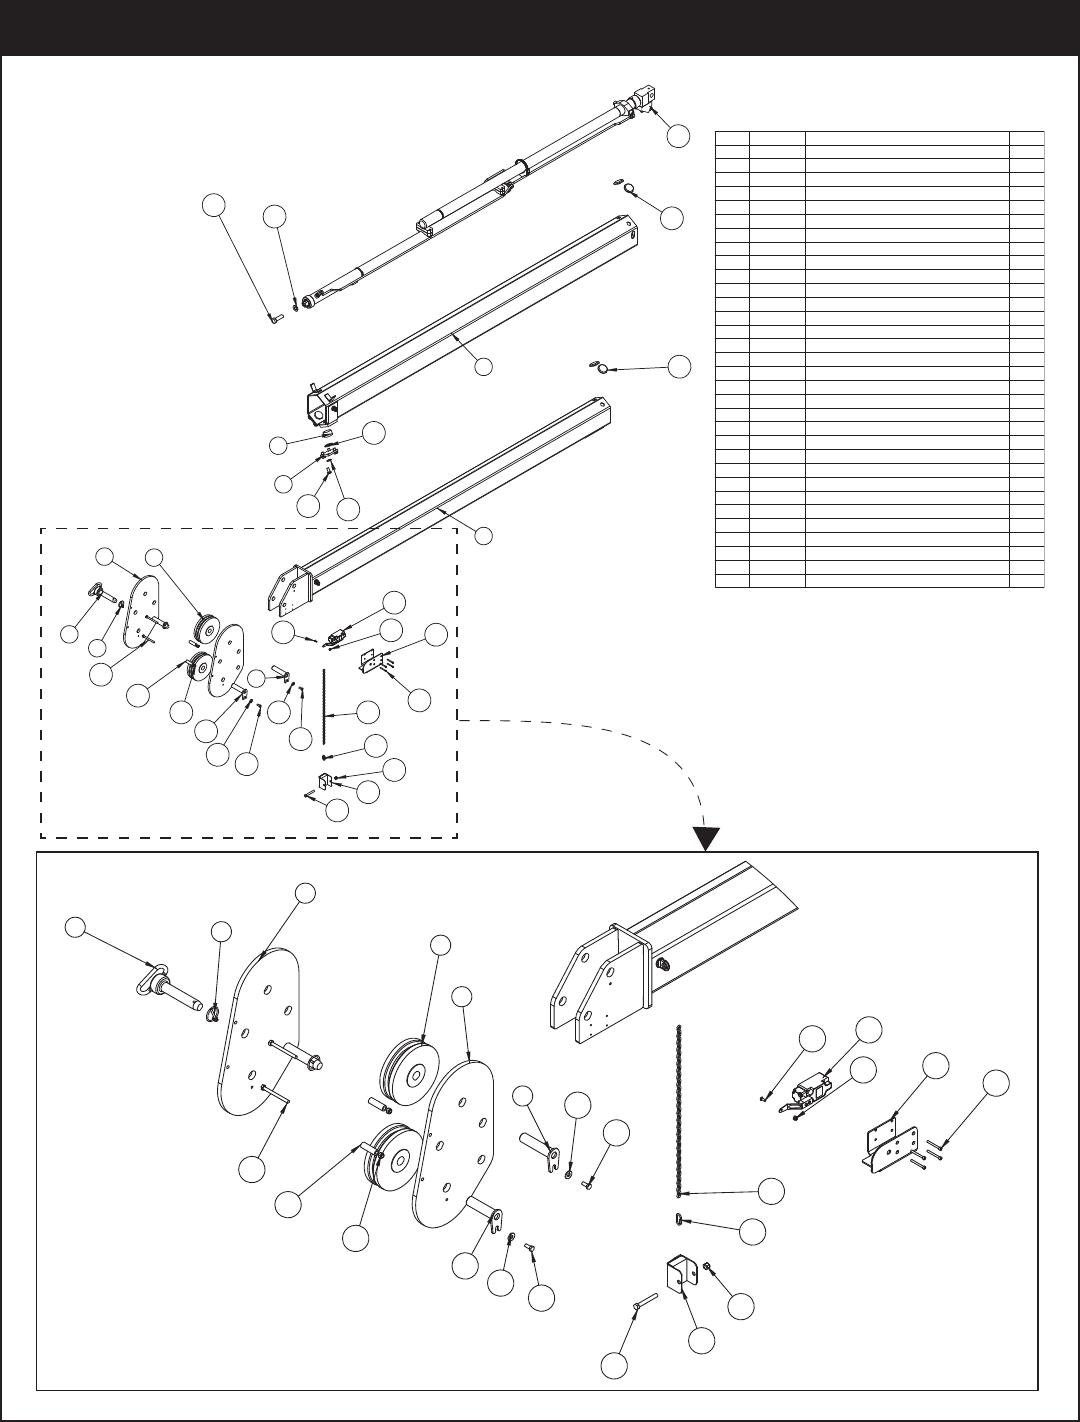 Stellar Industries 5521 Users Manual Telescopic Crane